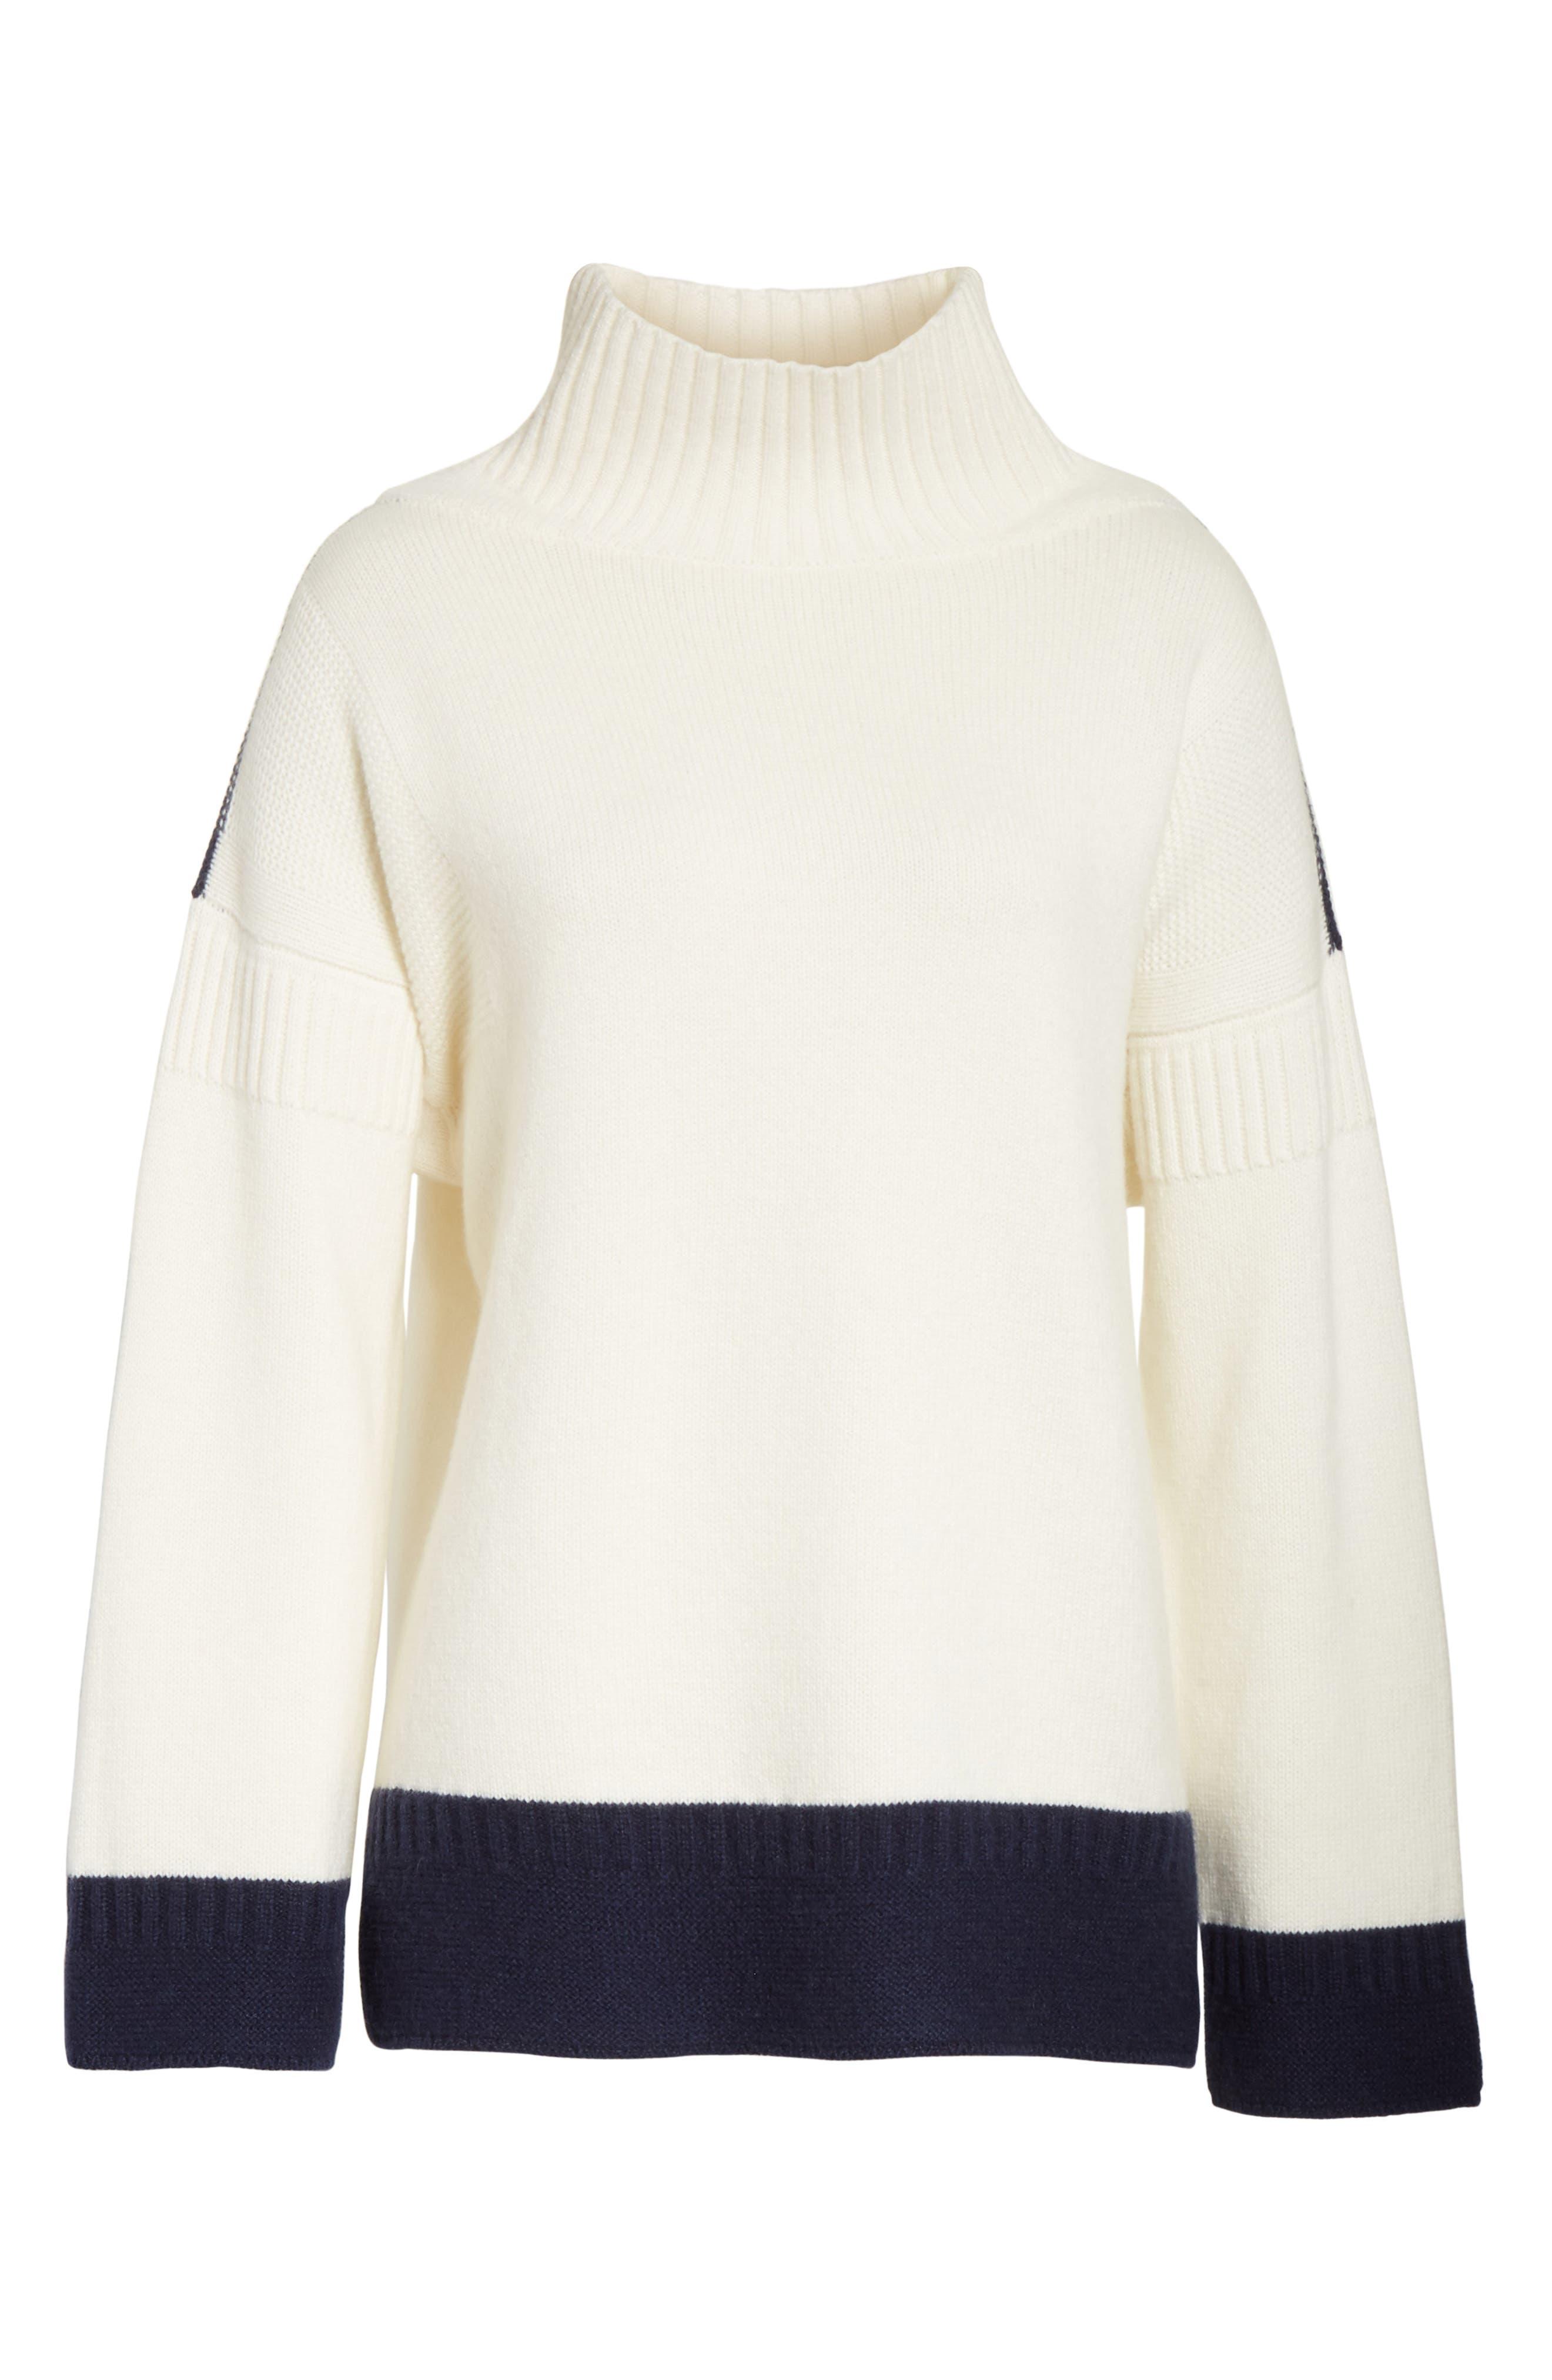 Aubree Funnel Neck Cashmere Sweater,                             Alternate thumbnail 6, color,                             908